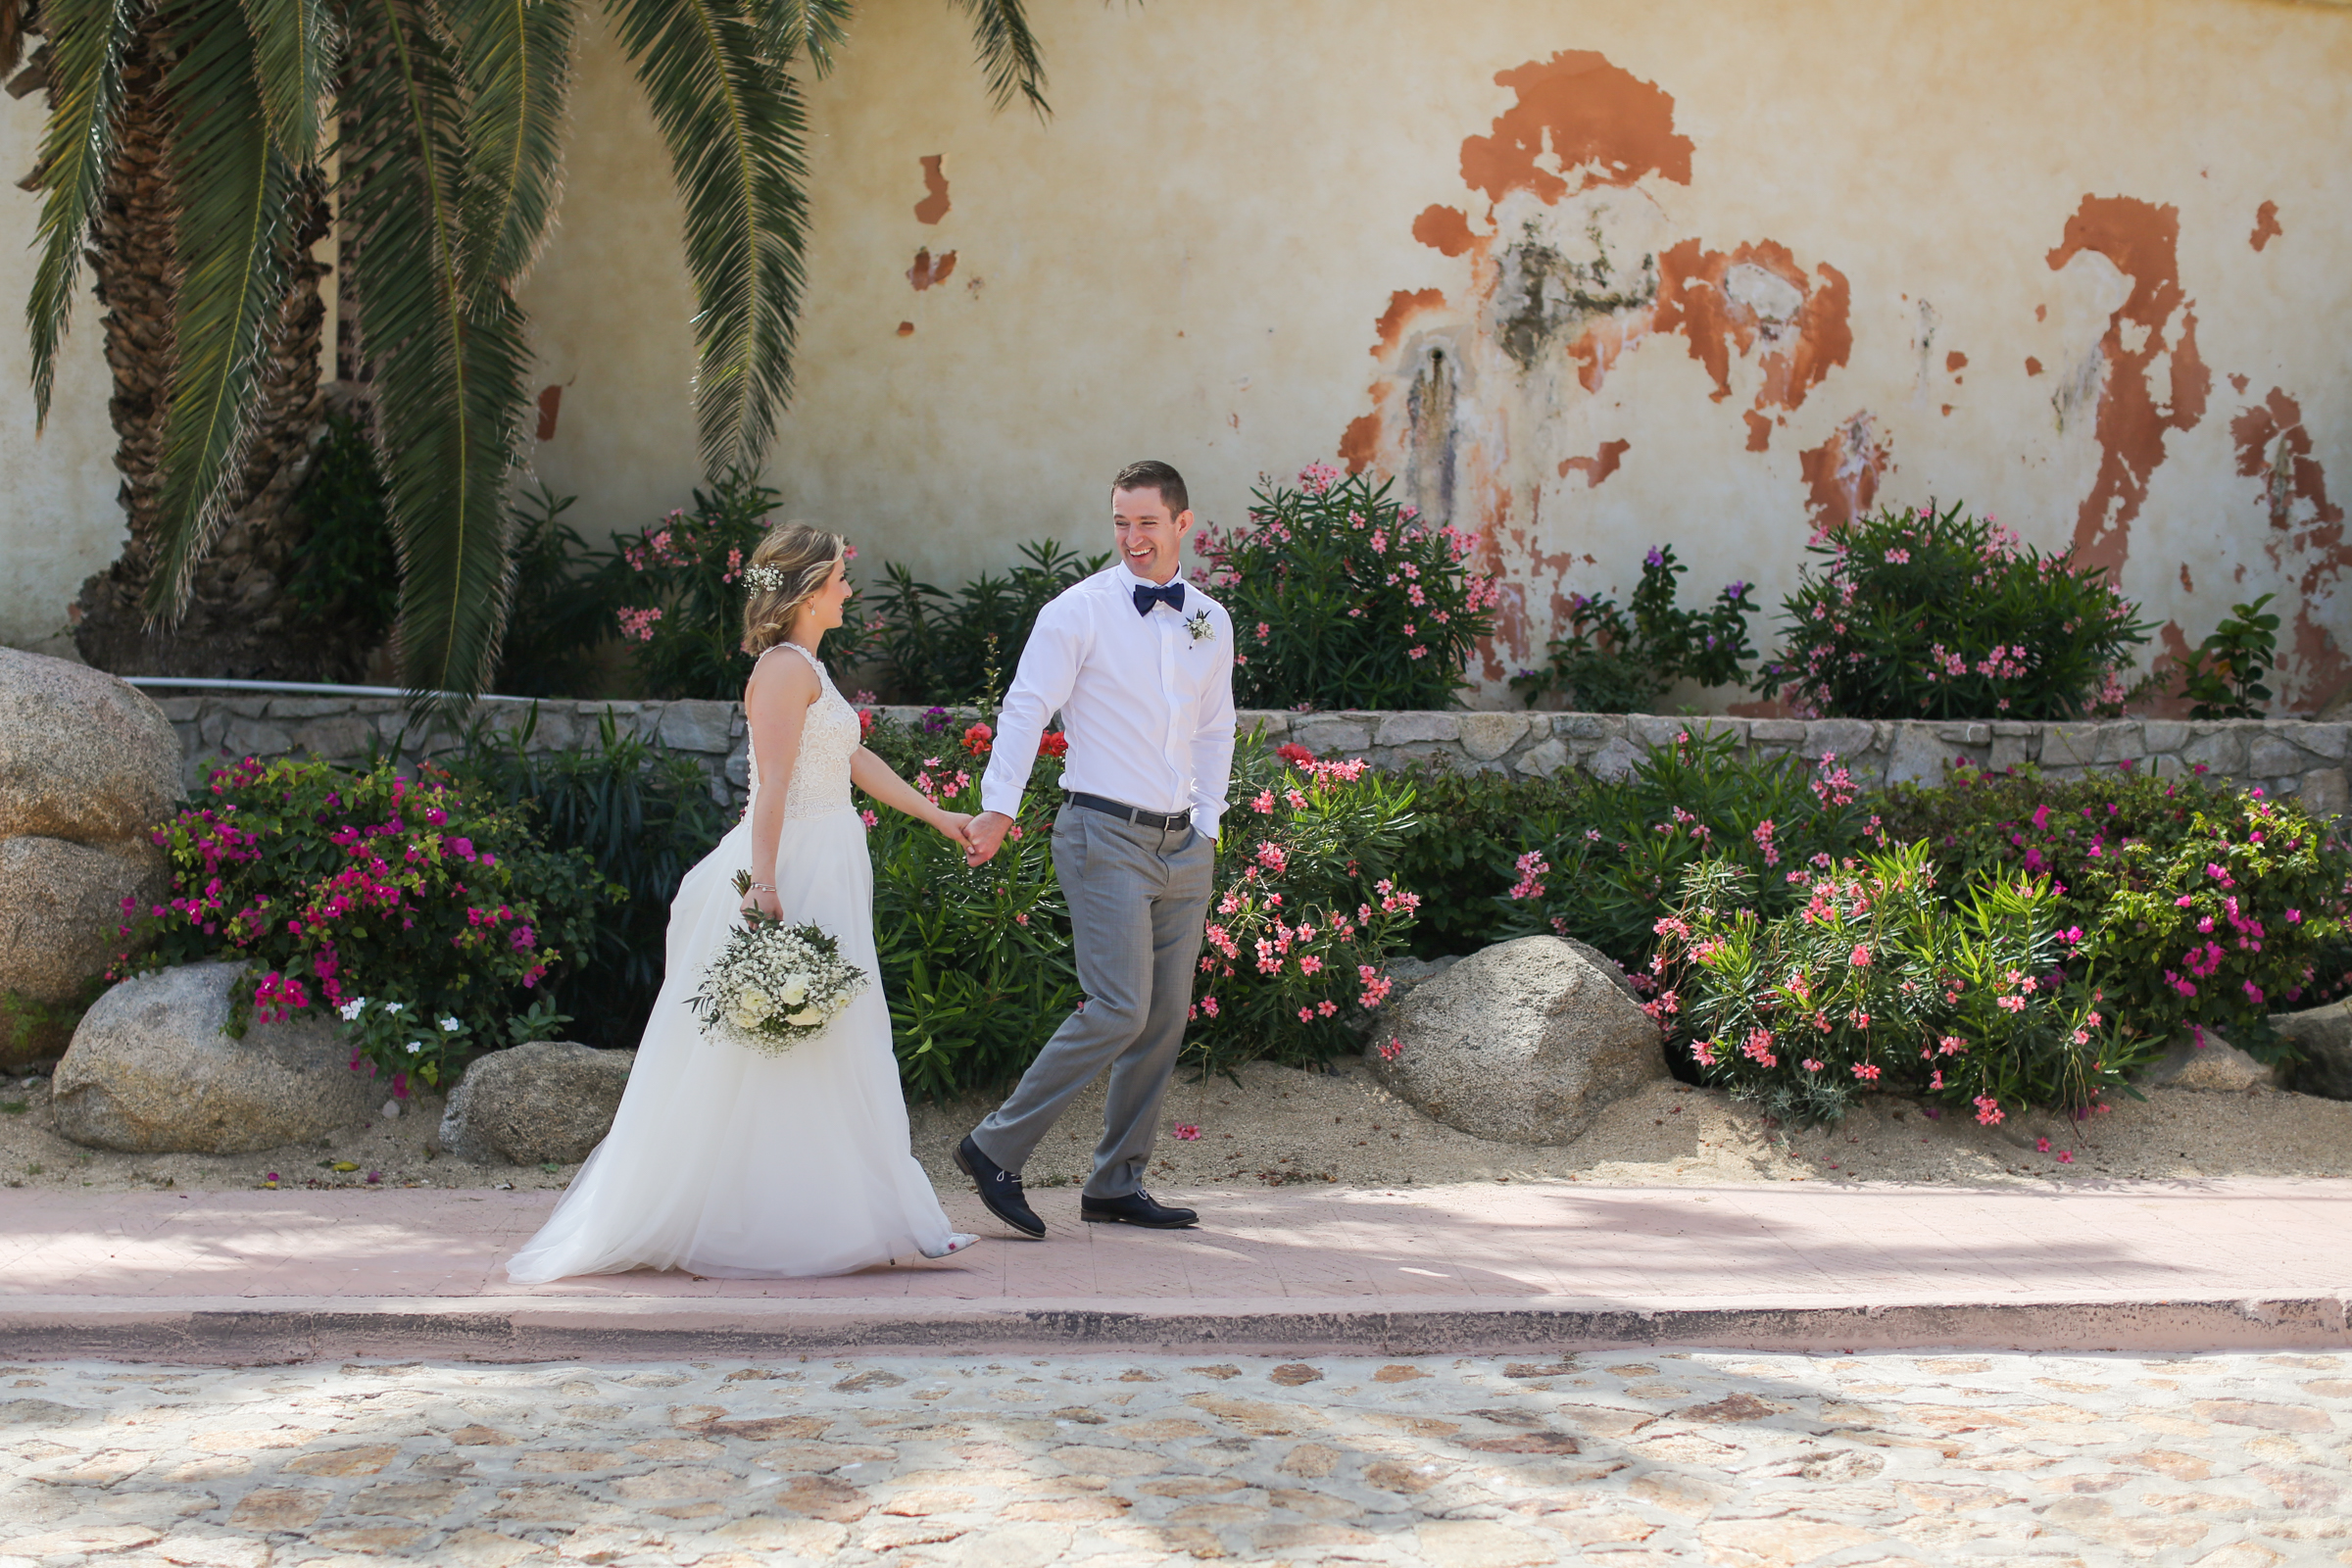 Katie+Chris-Mexico-Wedding-57.jpg